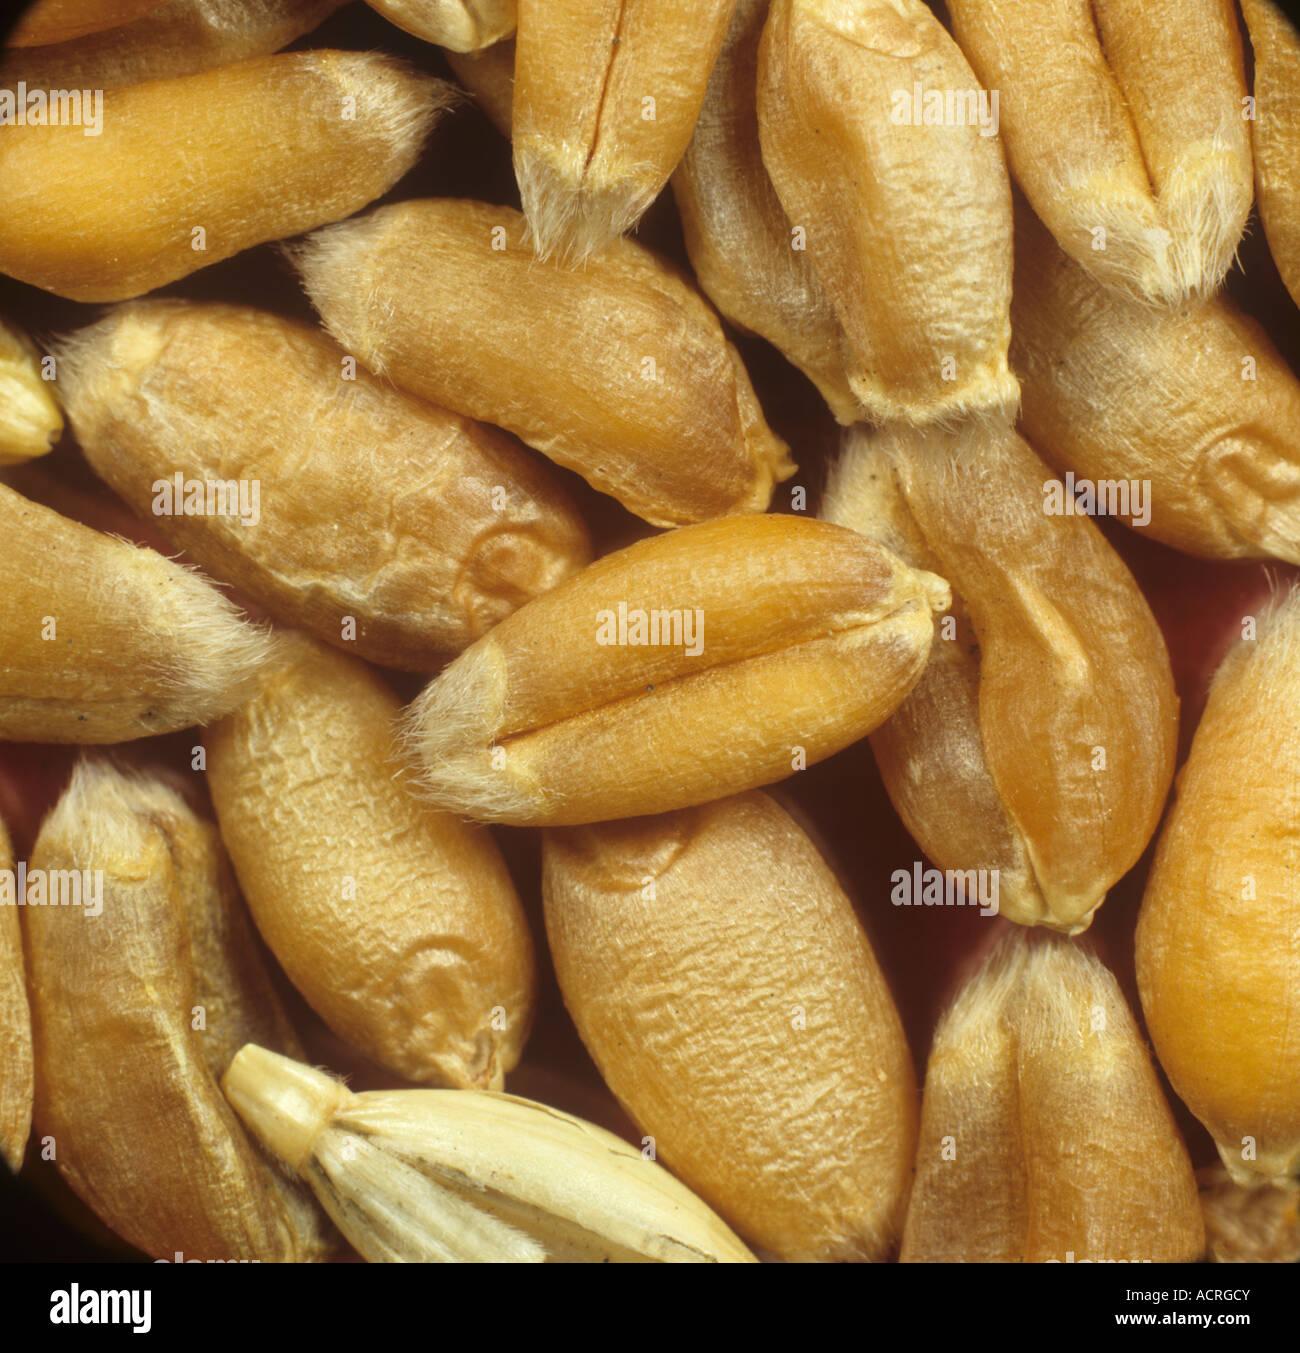 Wheat seed or grain - Stock Image